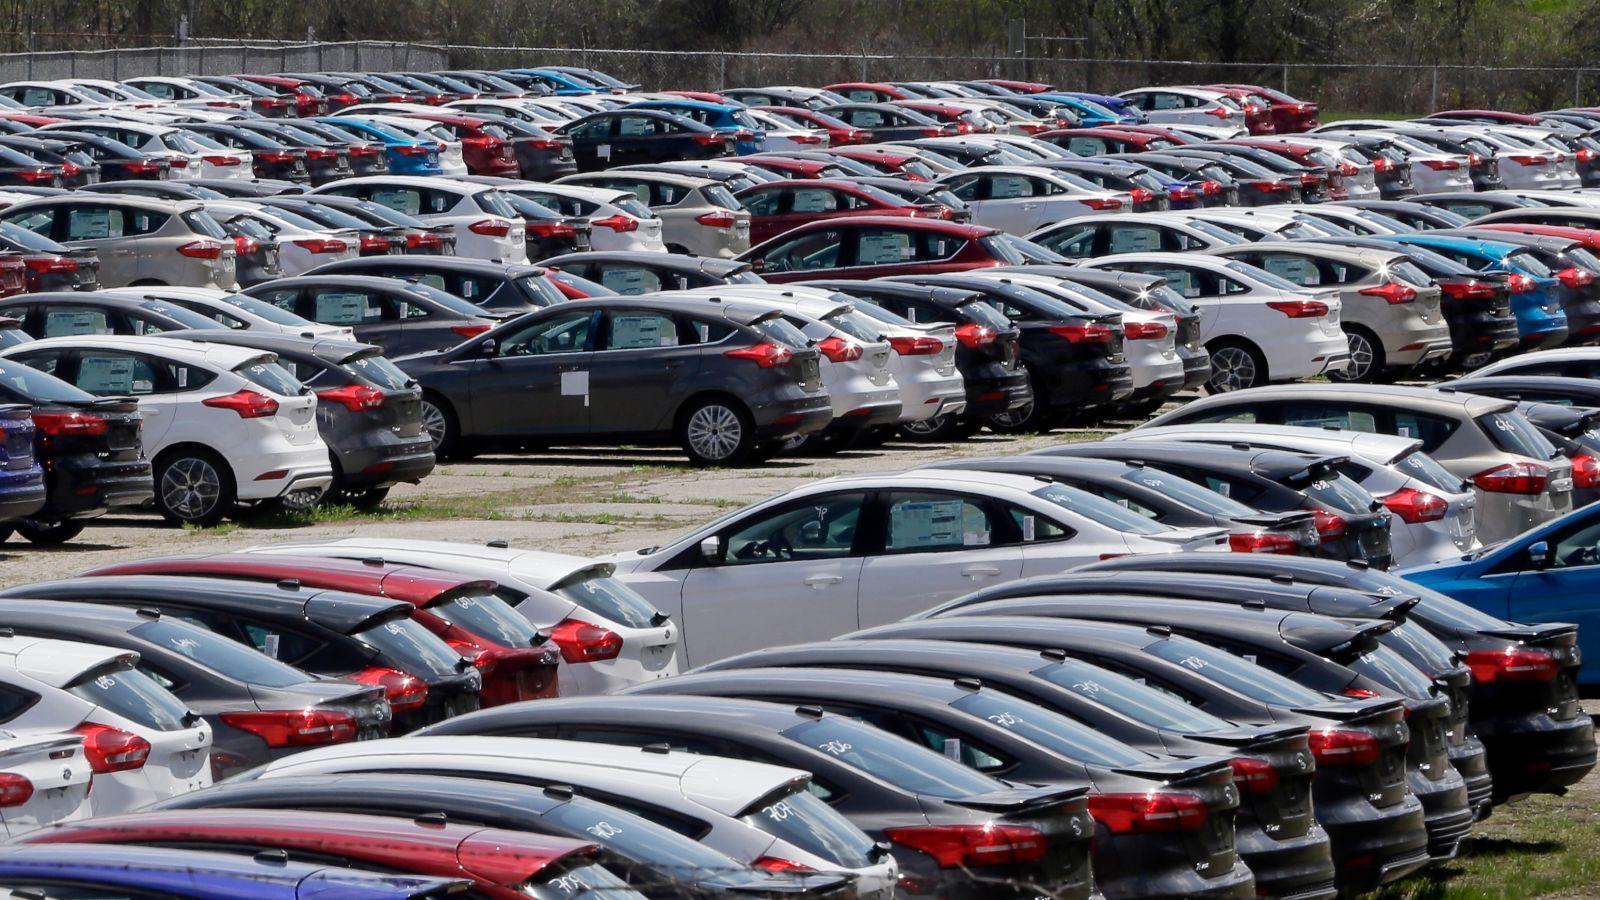 Americans Owe A Record 1.1 Trillion In Car Loanshttp